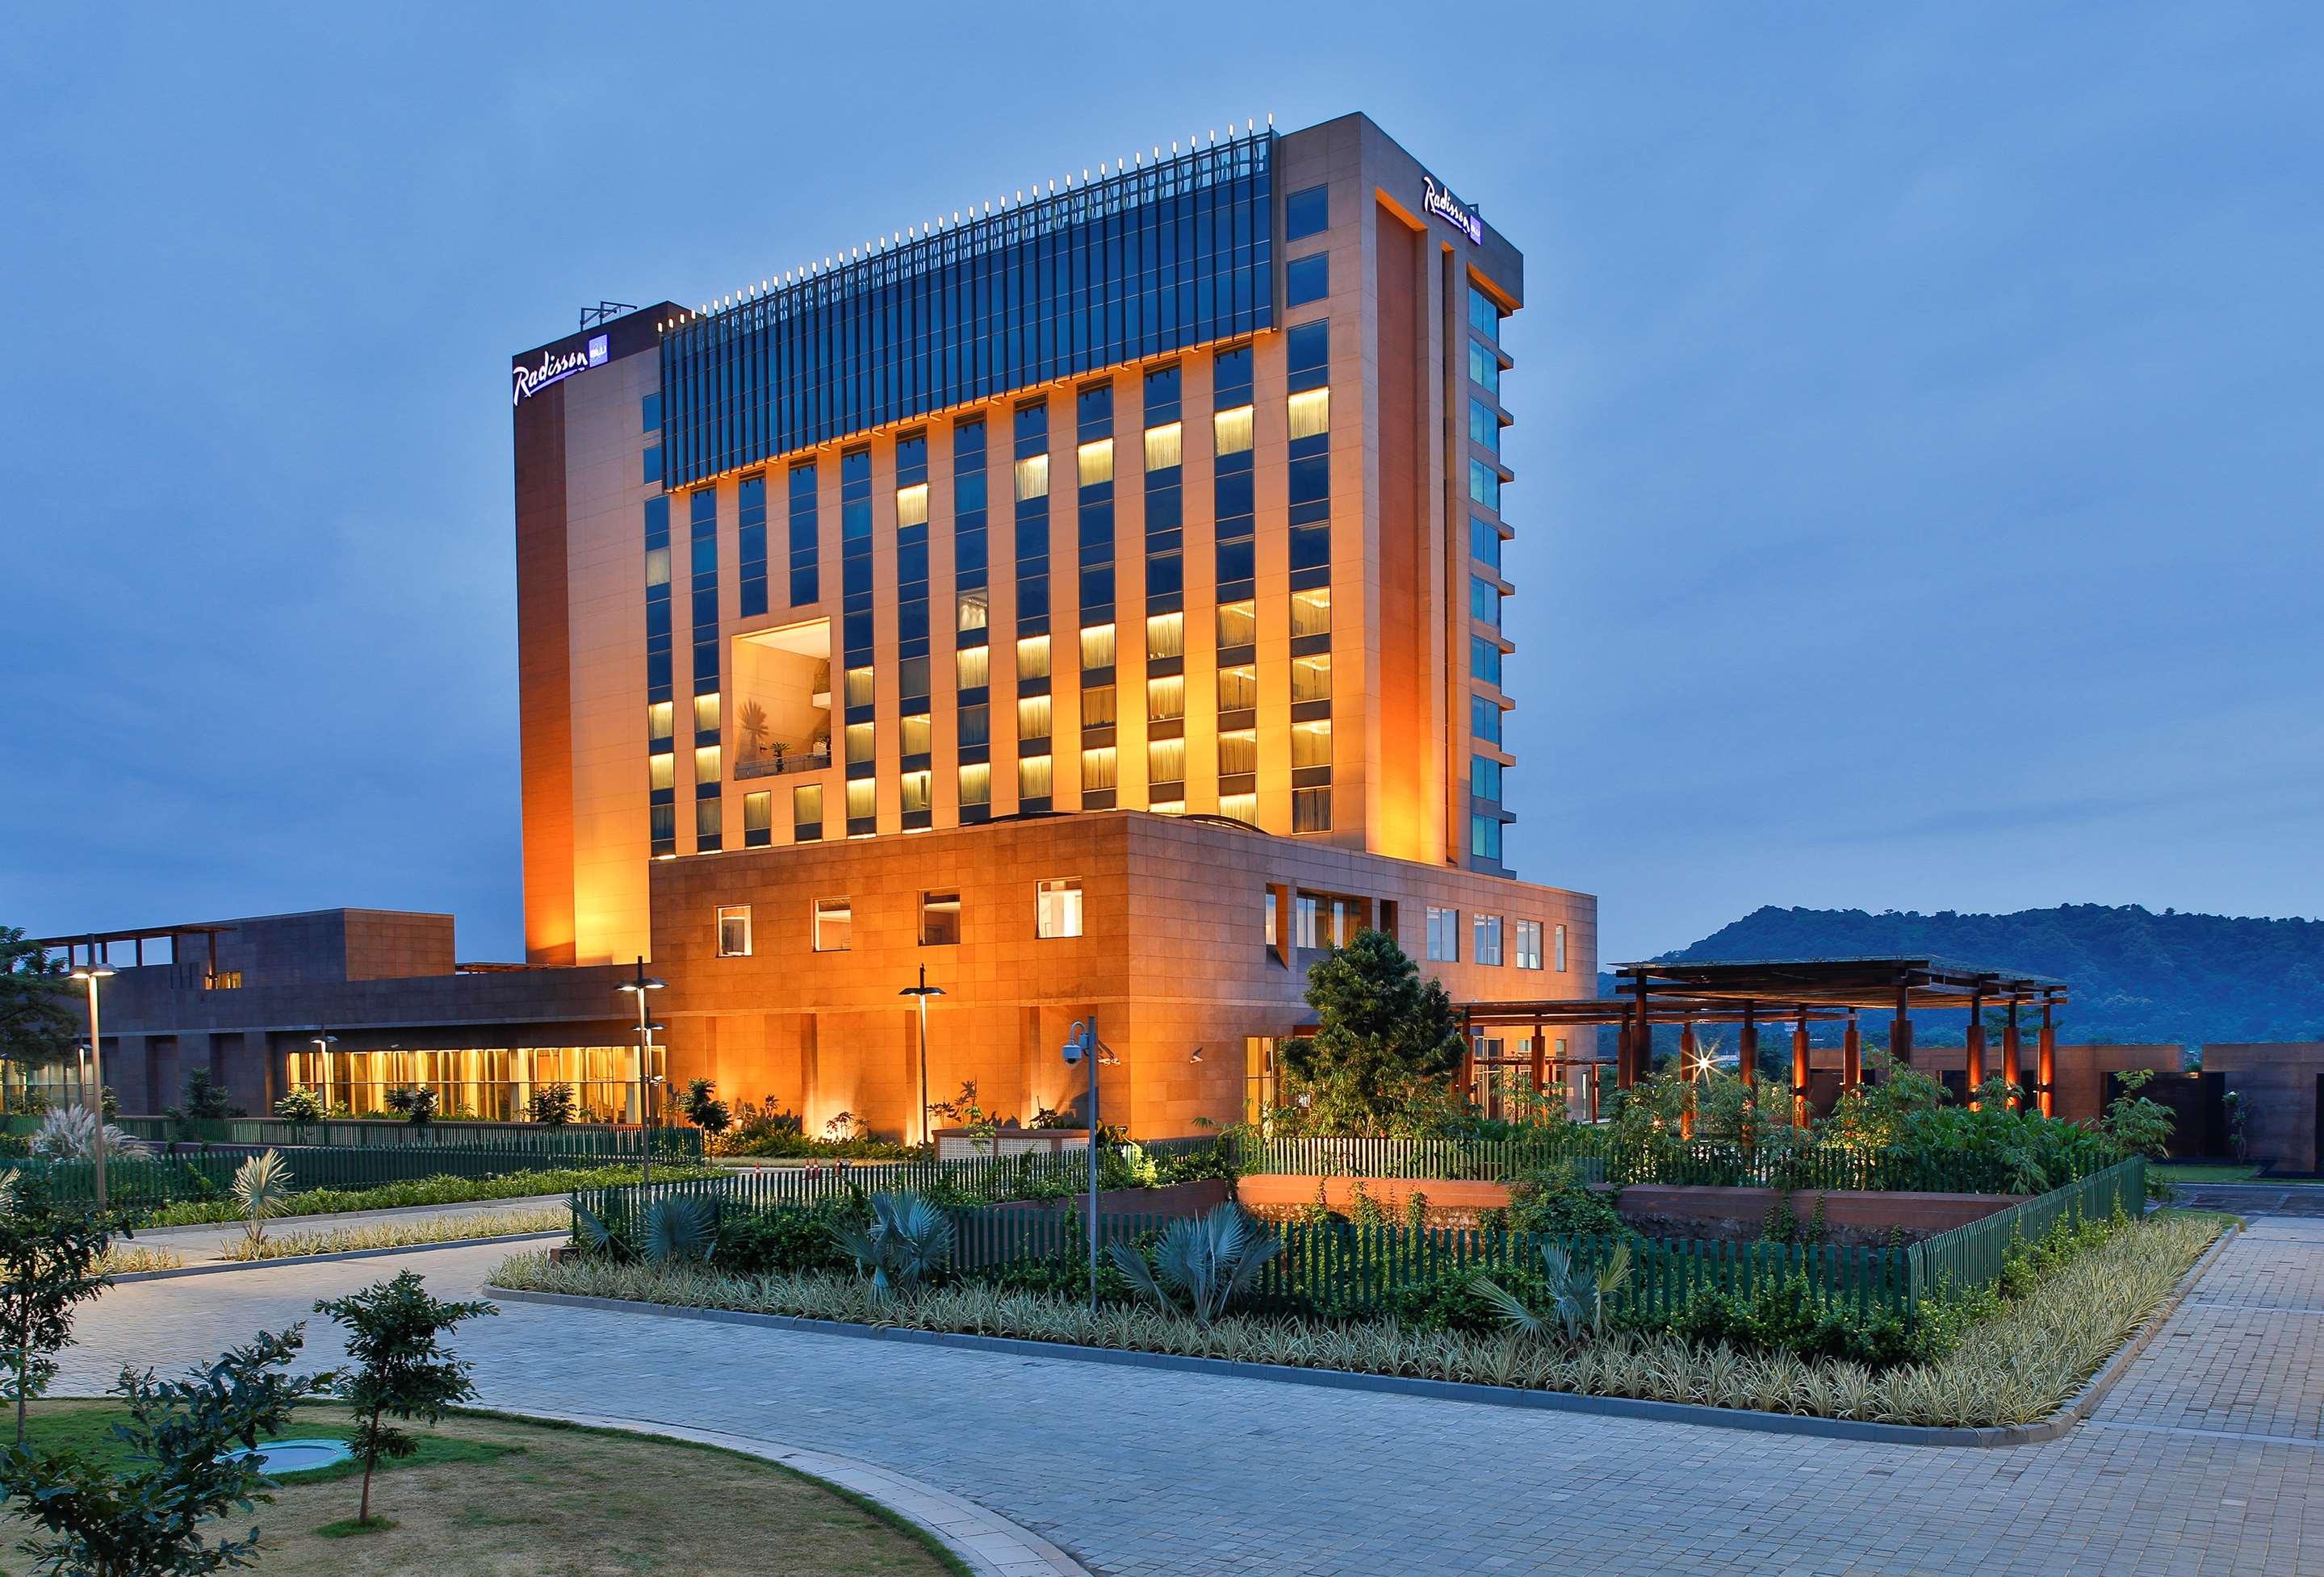 Hotels in Guwahati | Radisson Blu Hotel Guwahati